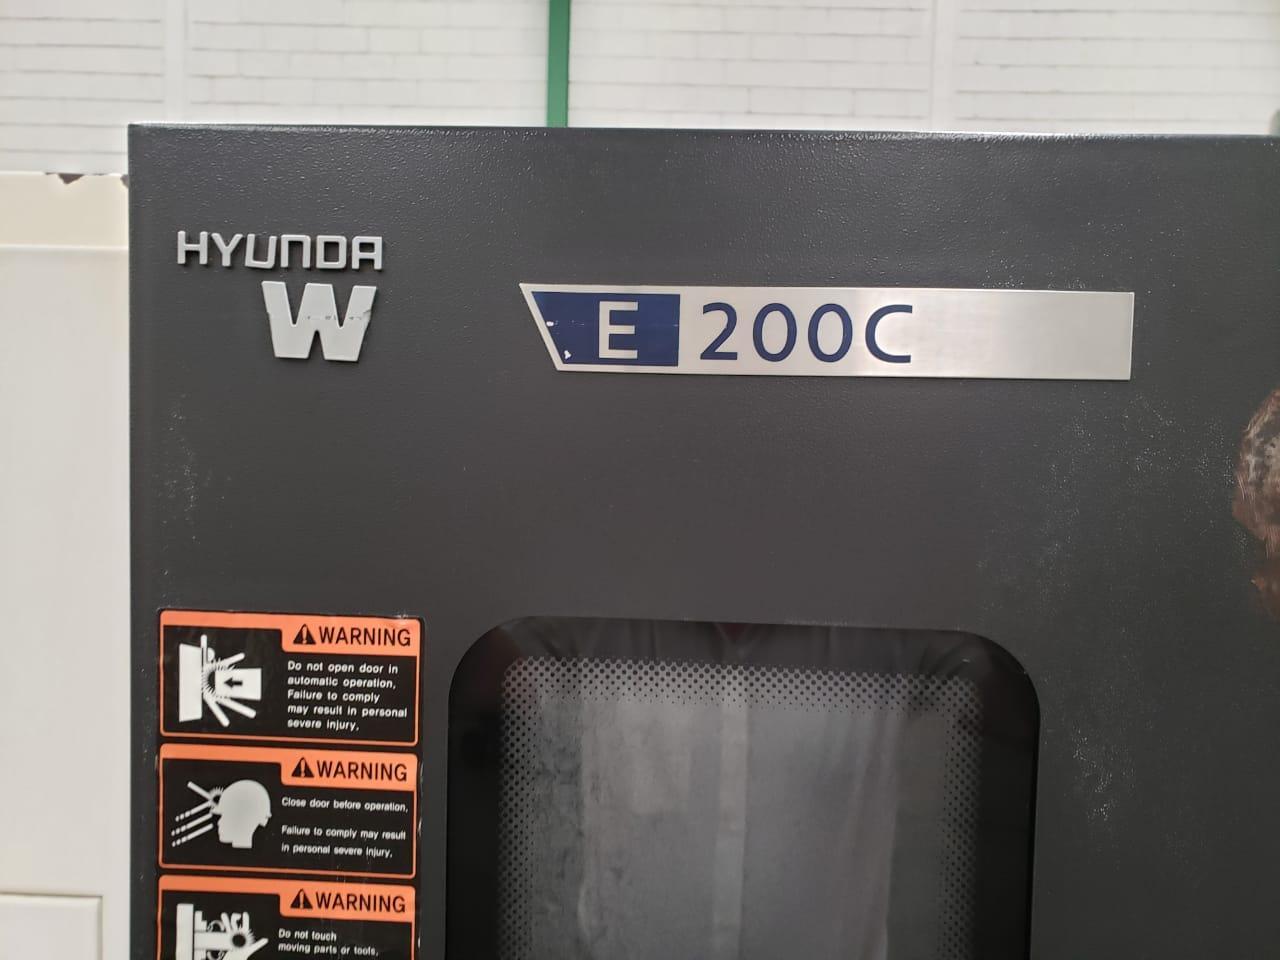 2013 Hyundai Wia E200C - CNC Horizontal Lathe